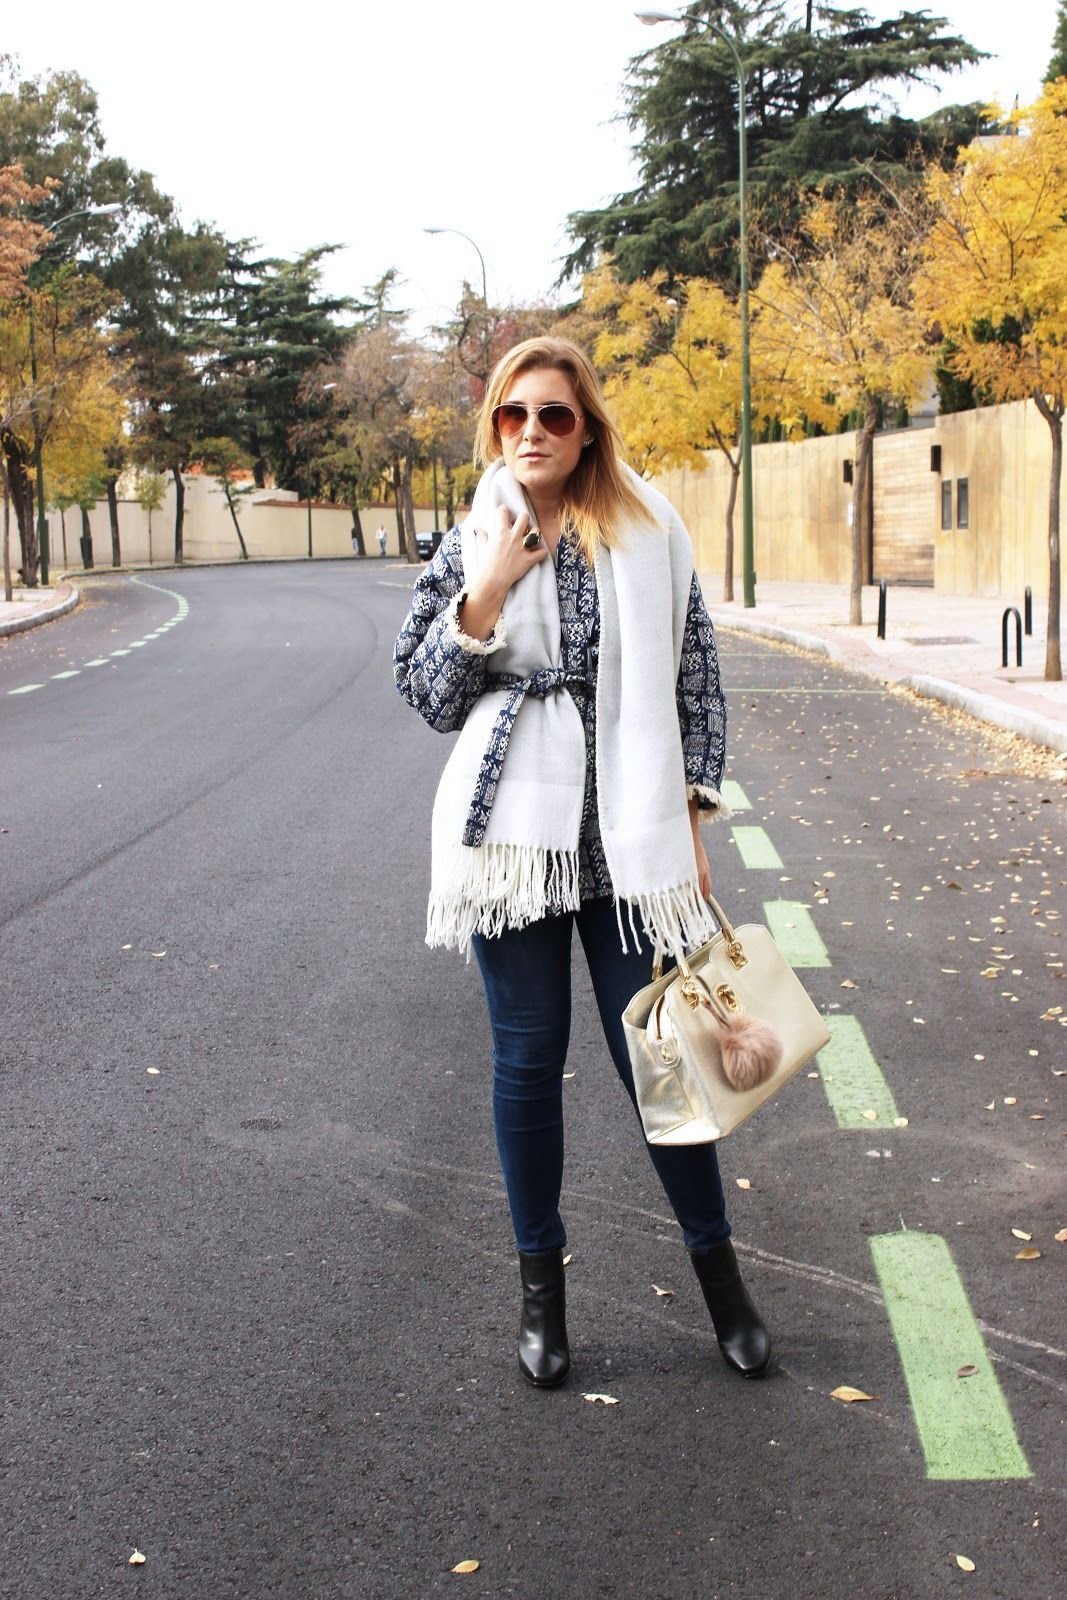 THEULIFESTYLE | blog de moda decoracion y lifestyle #theulifestyle #fashionblogger #style #blogger #personalstyle #fashion #look #moda #streetstyle #outfitoftheday #zaradaily #wiw #wiwt #ootd #maxi #scarf #baby #blue #liujo #bag #lespetites #coat #pompom #charm